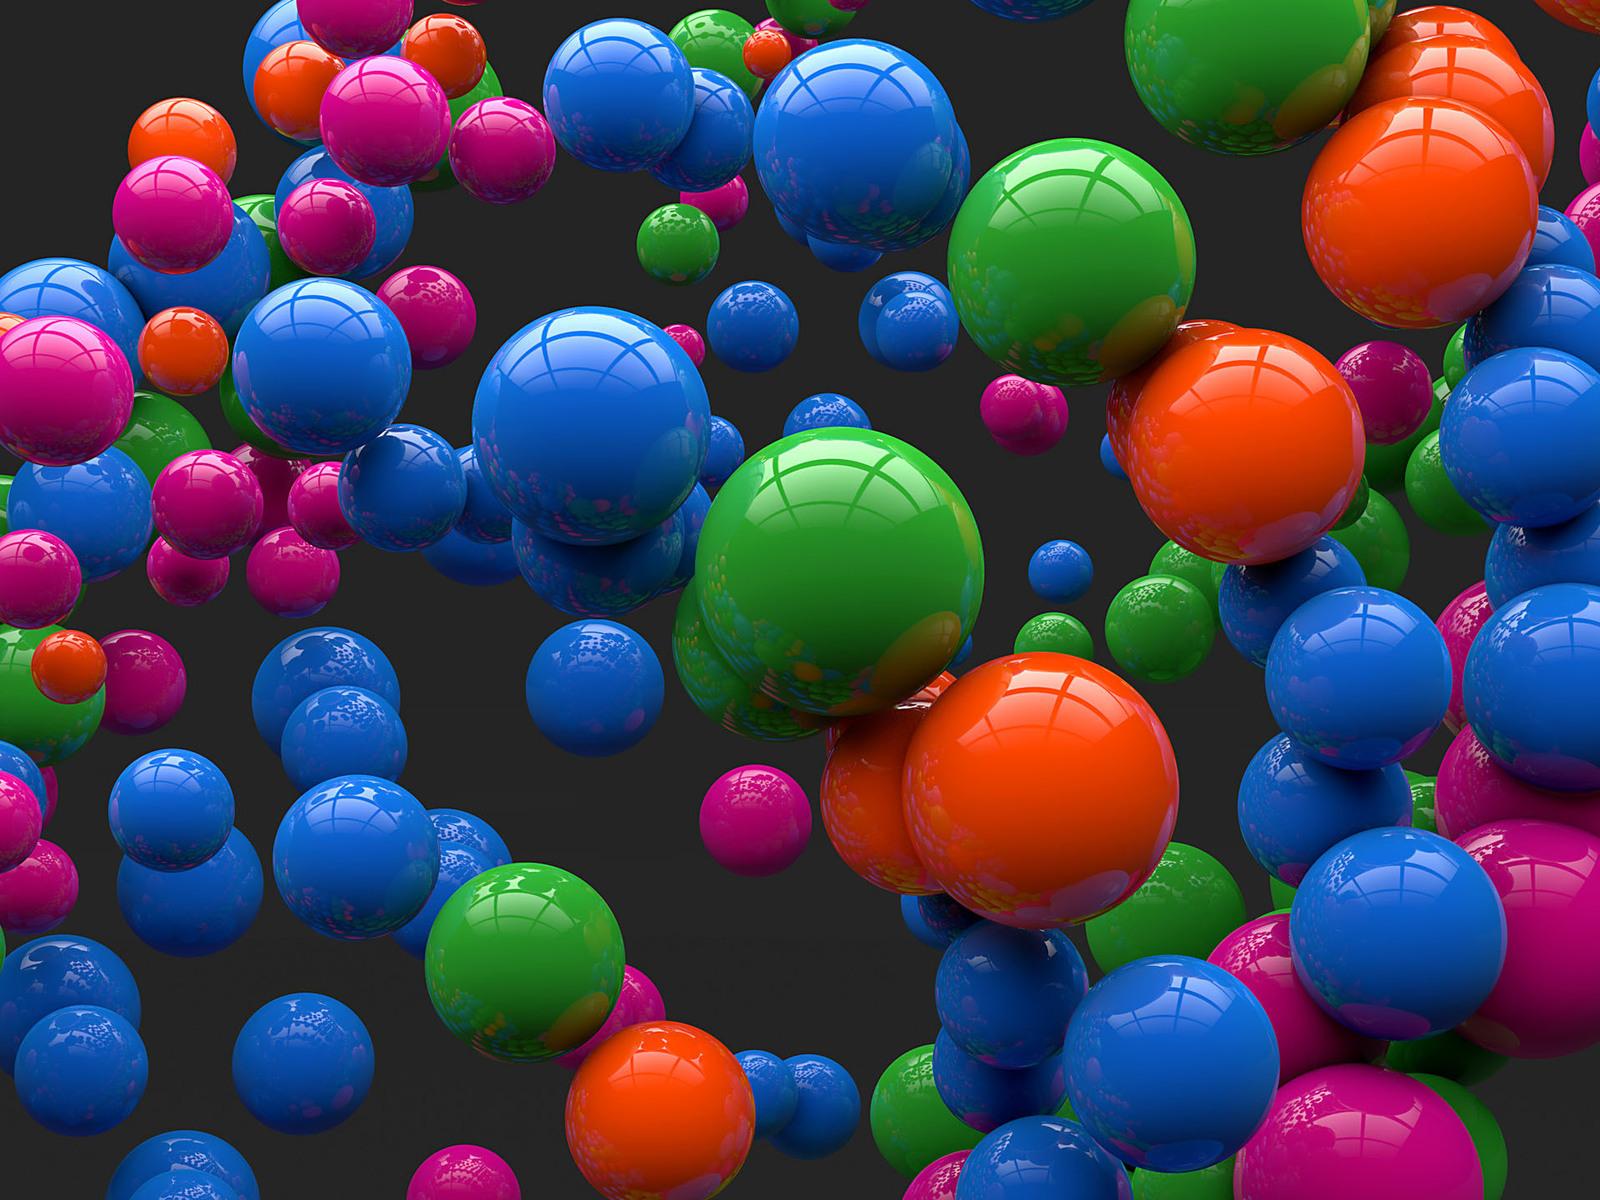 http://3.bp.blogspot.com/-vhNwaLg-Kgo/UKd7KOiLqjI/AAAAAAAAGK4/rwWEzI_bAmI/s1600/3D-Reflecting-Colorful-Balls-Spheres-HD-Desktop-Wallpaper.jpg